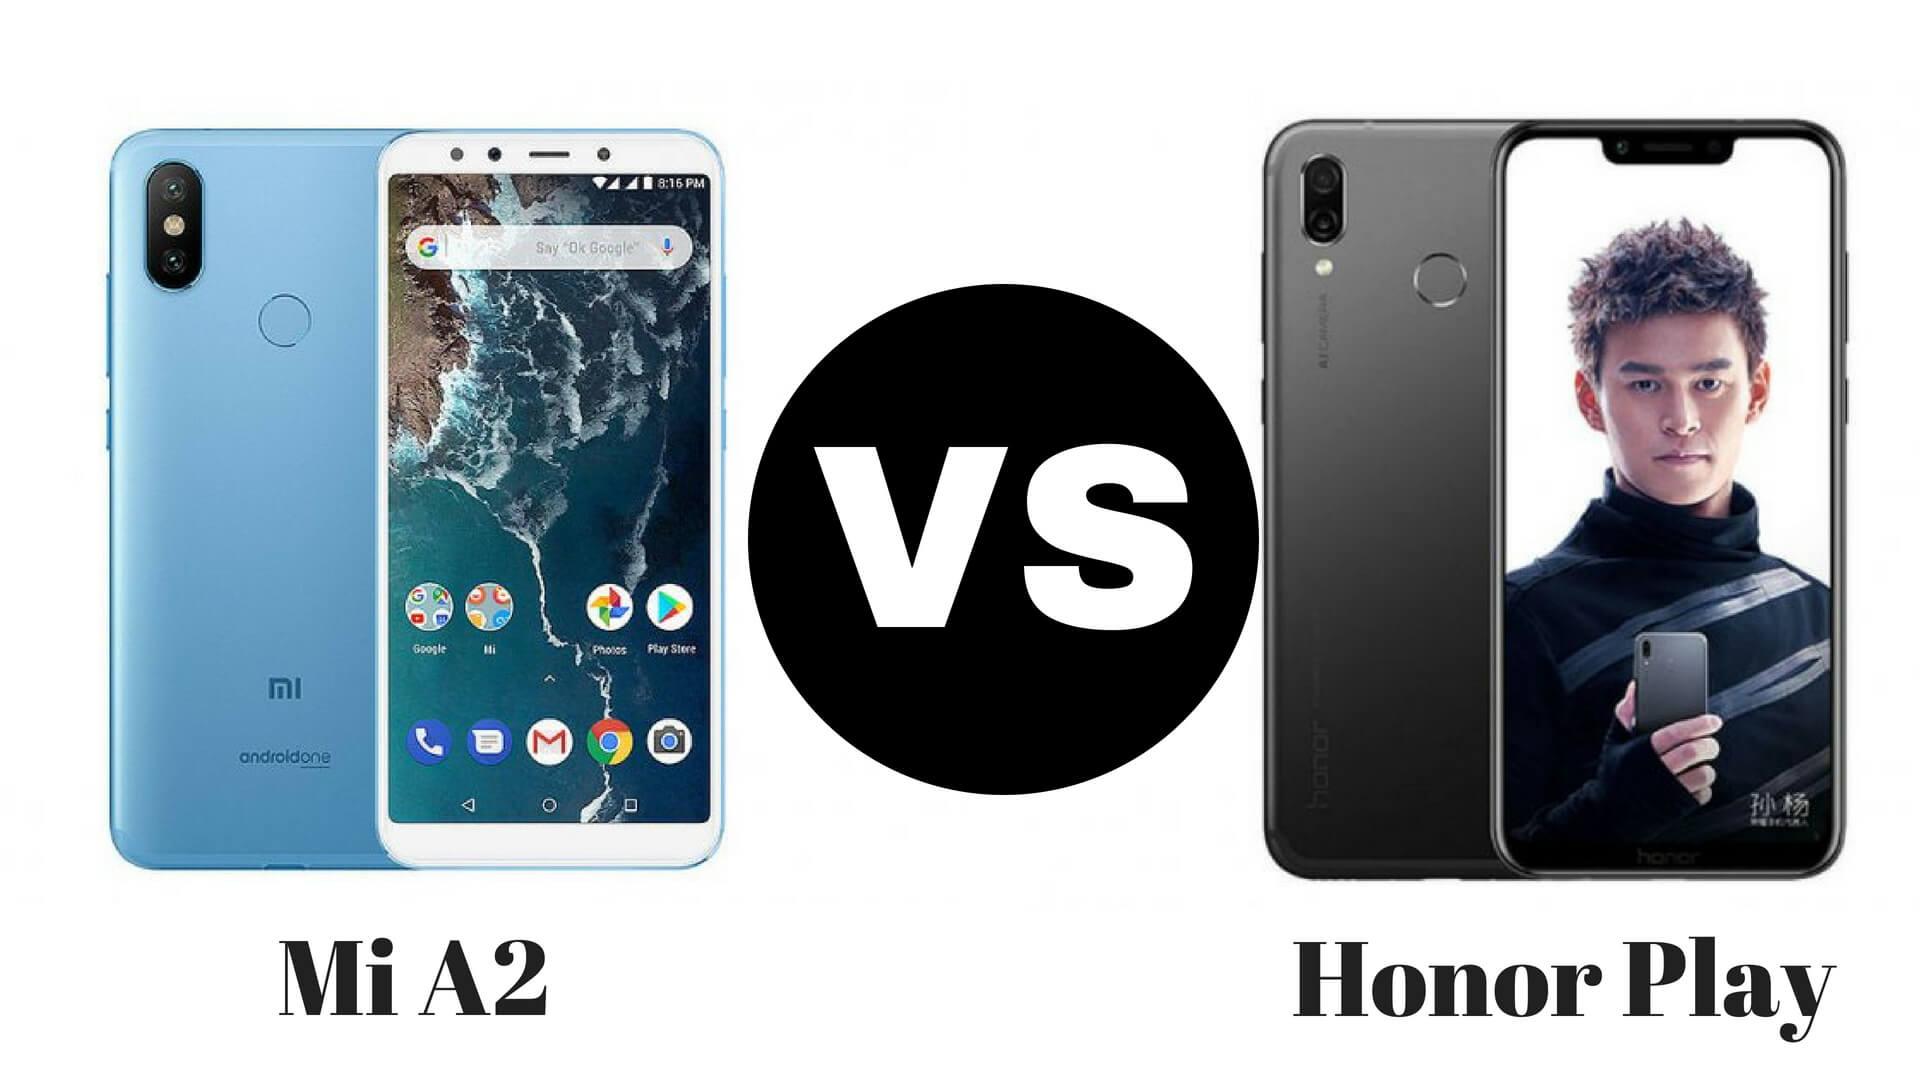 MI A2 vs Honor Play